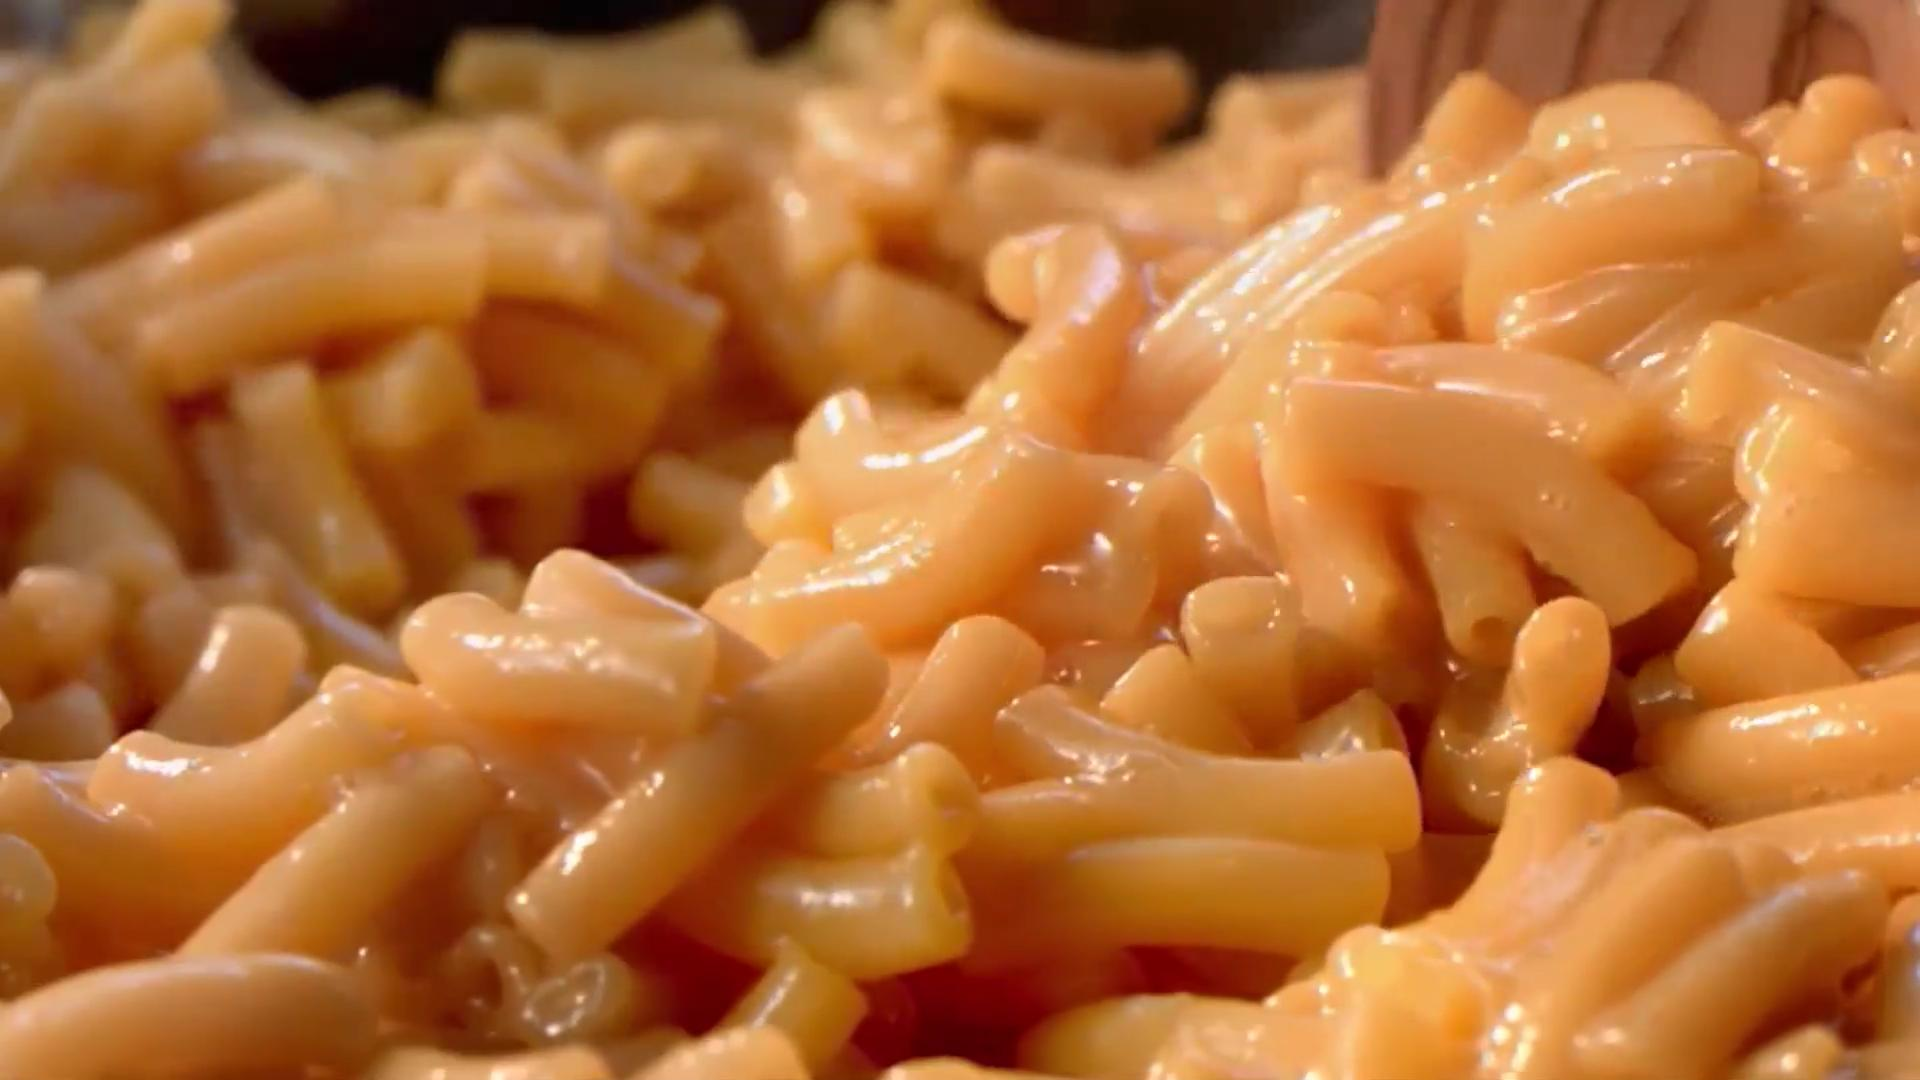 Kraft Changing Popular Mac and Cheese Recipe